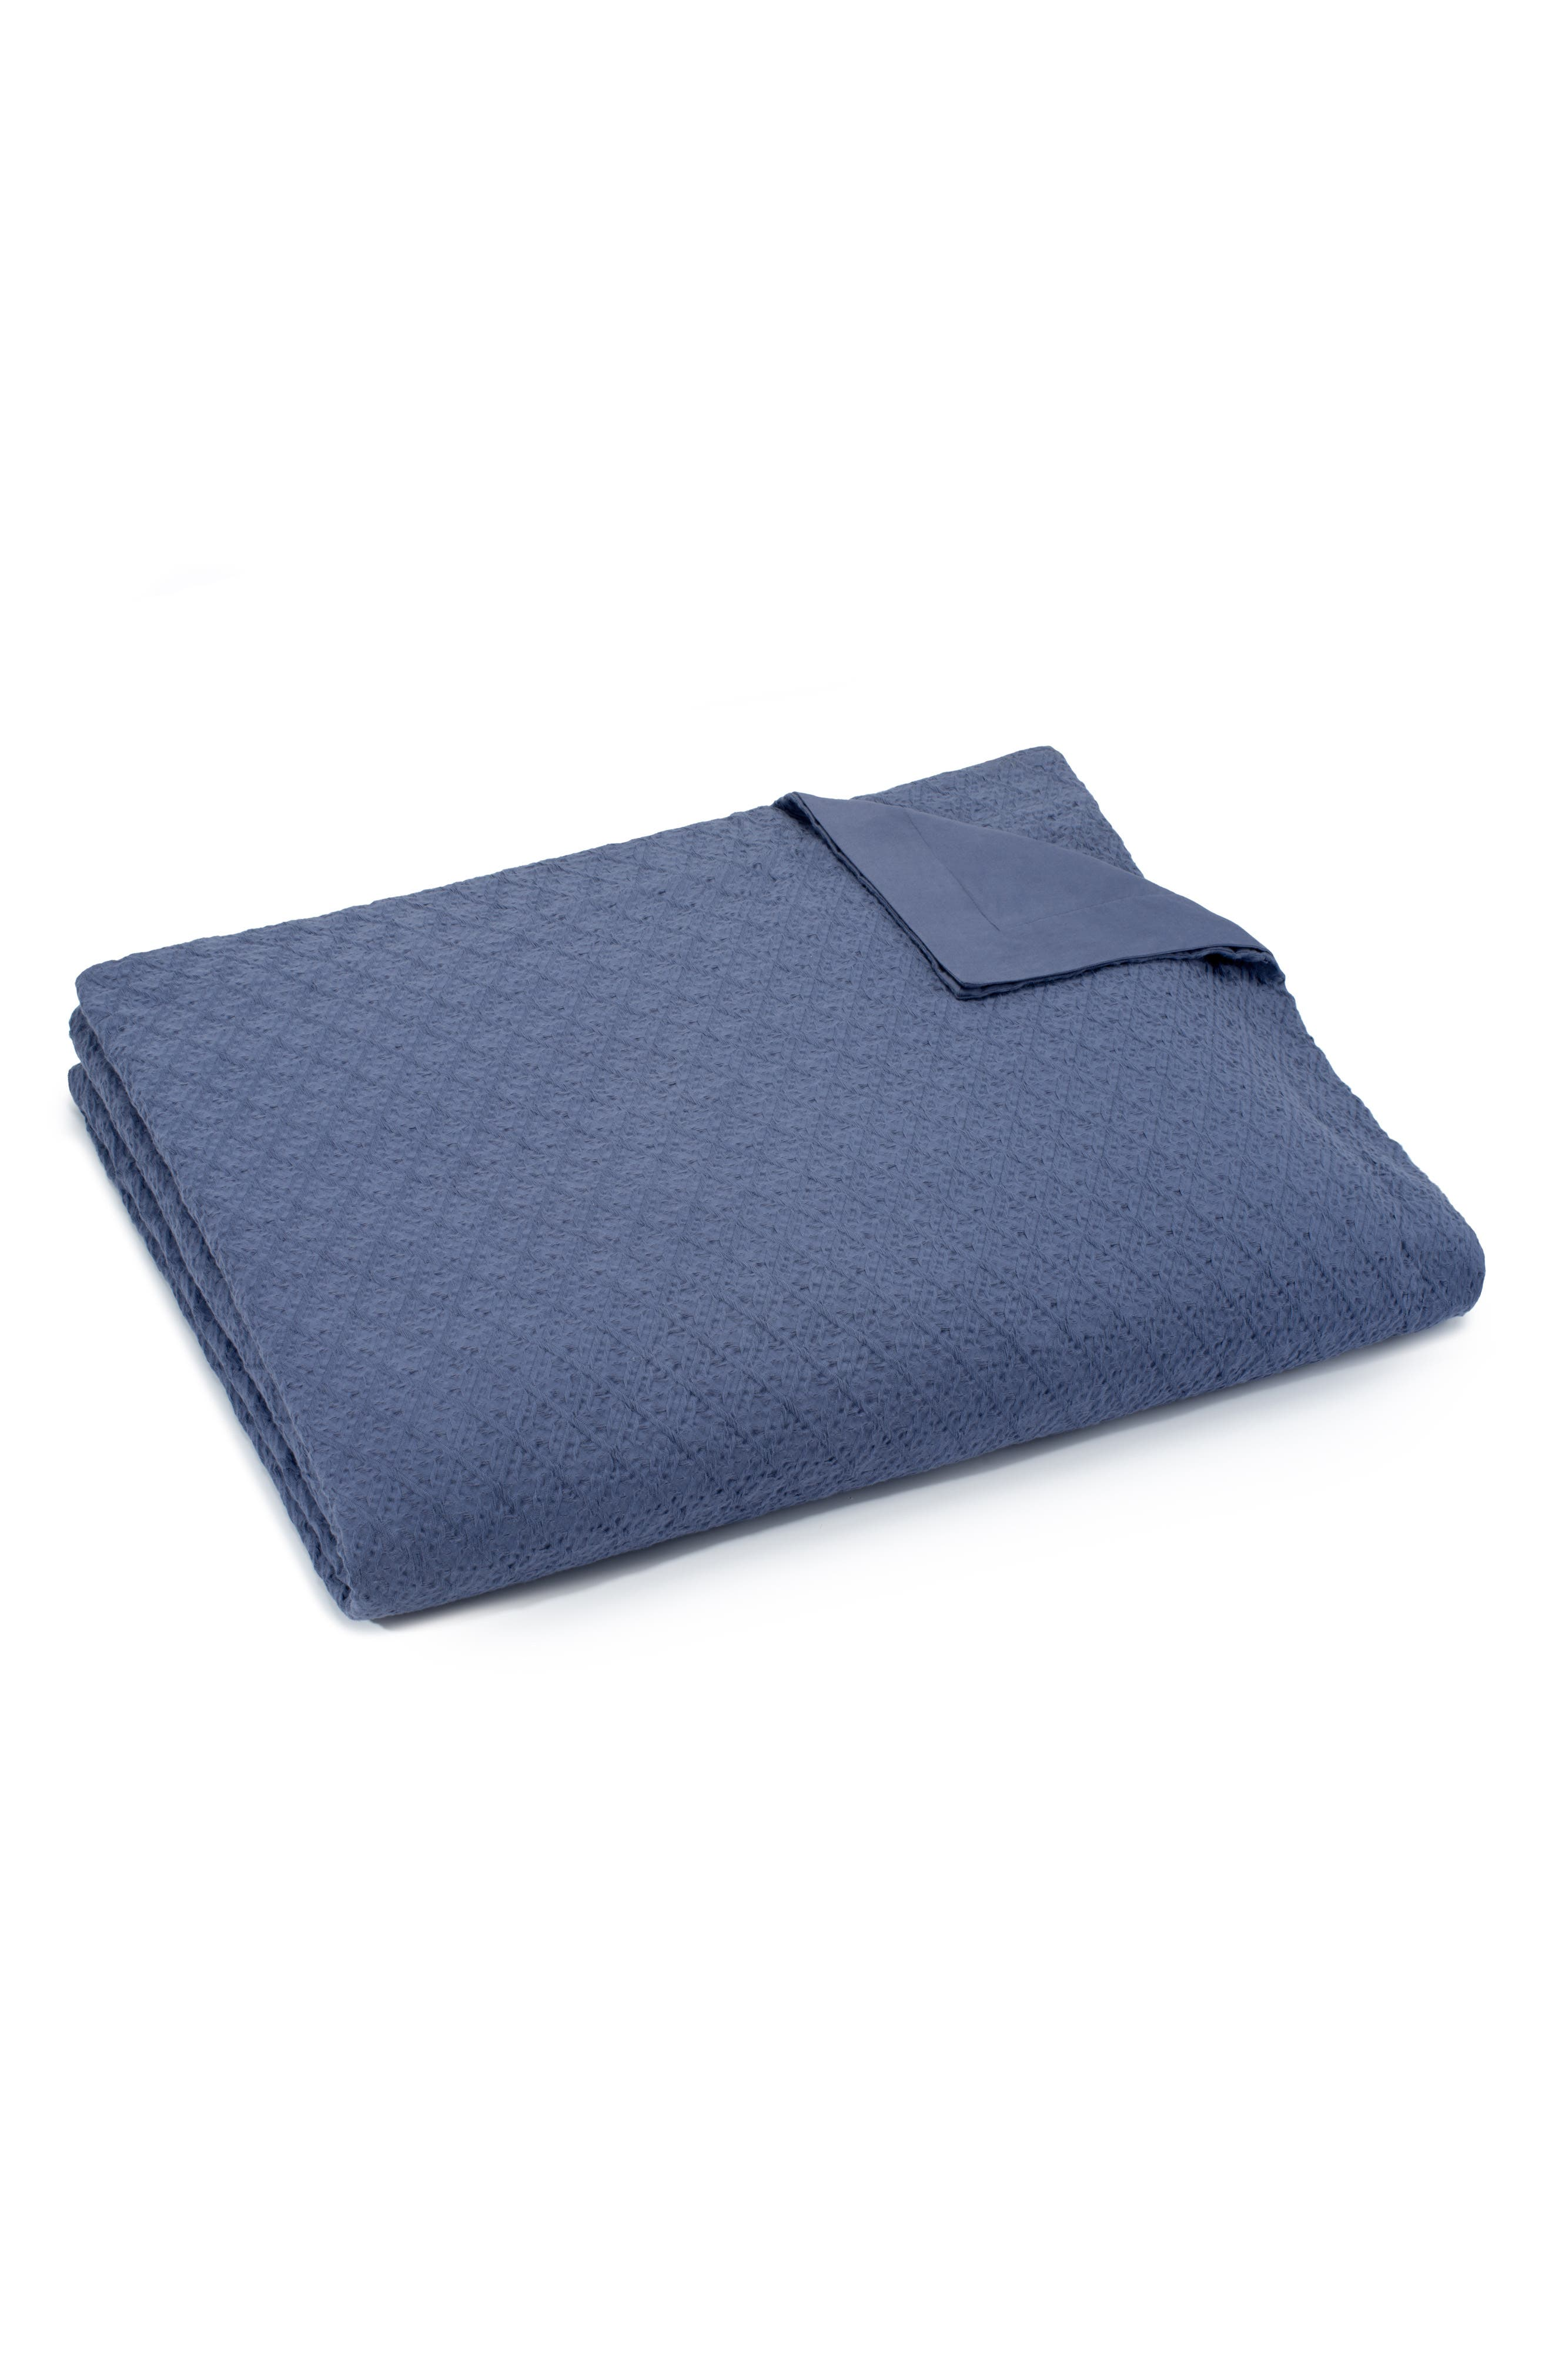 UGG<SUP>®</SUP> Coro Duvet Cover, Main, color, DENIM